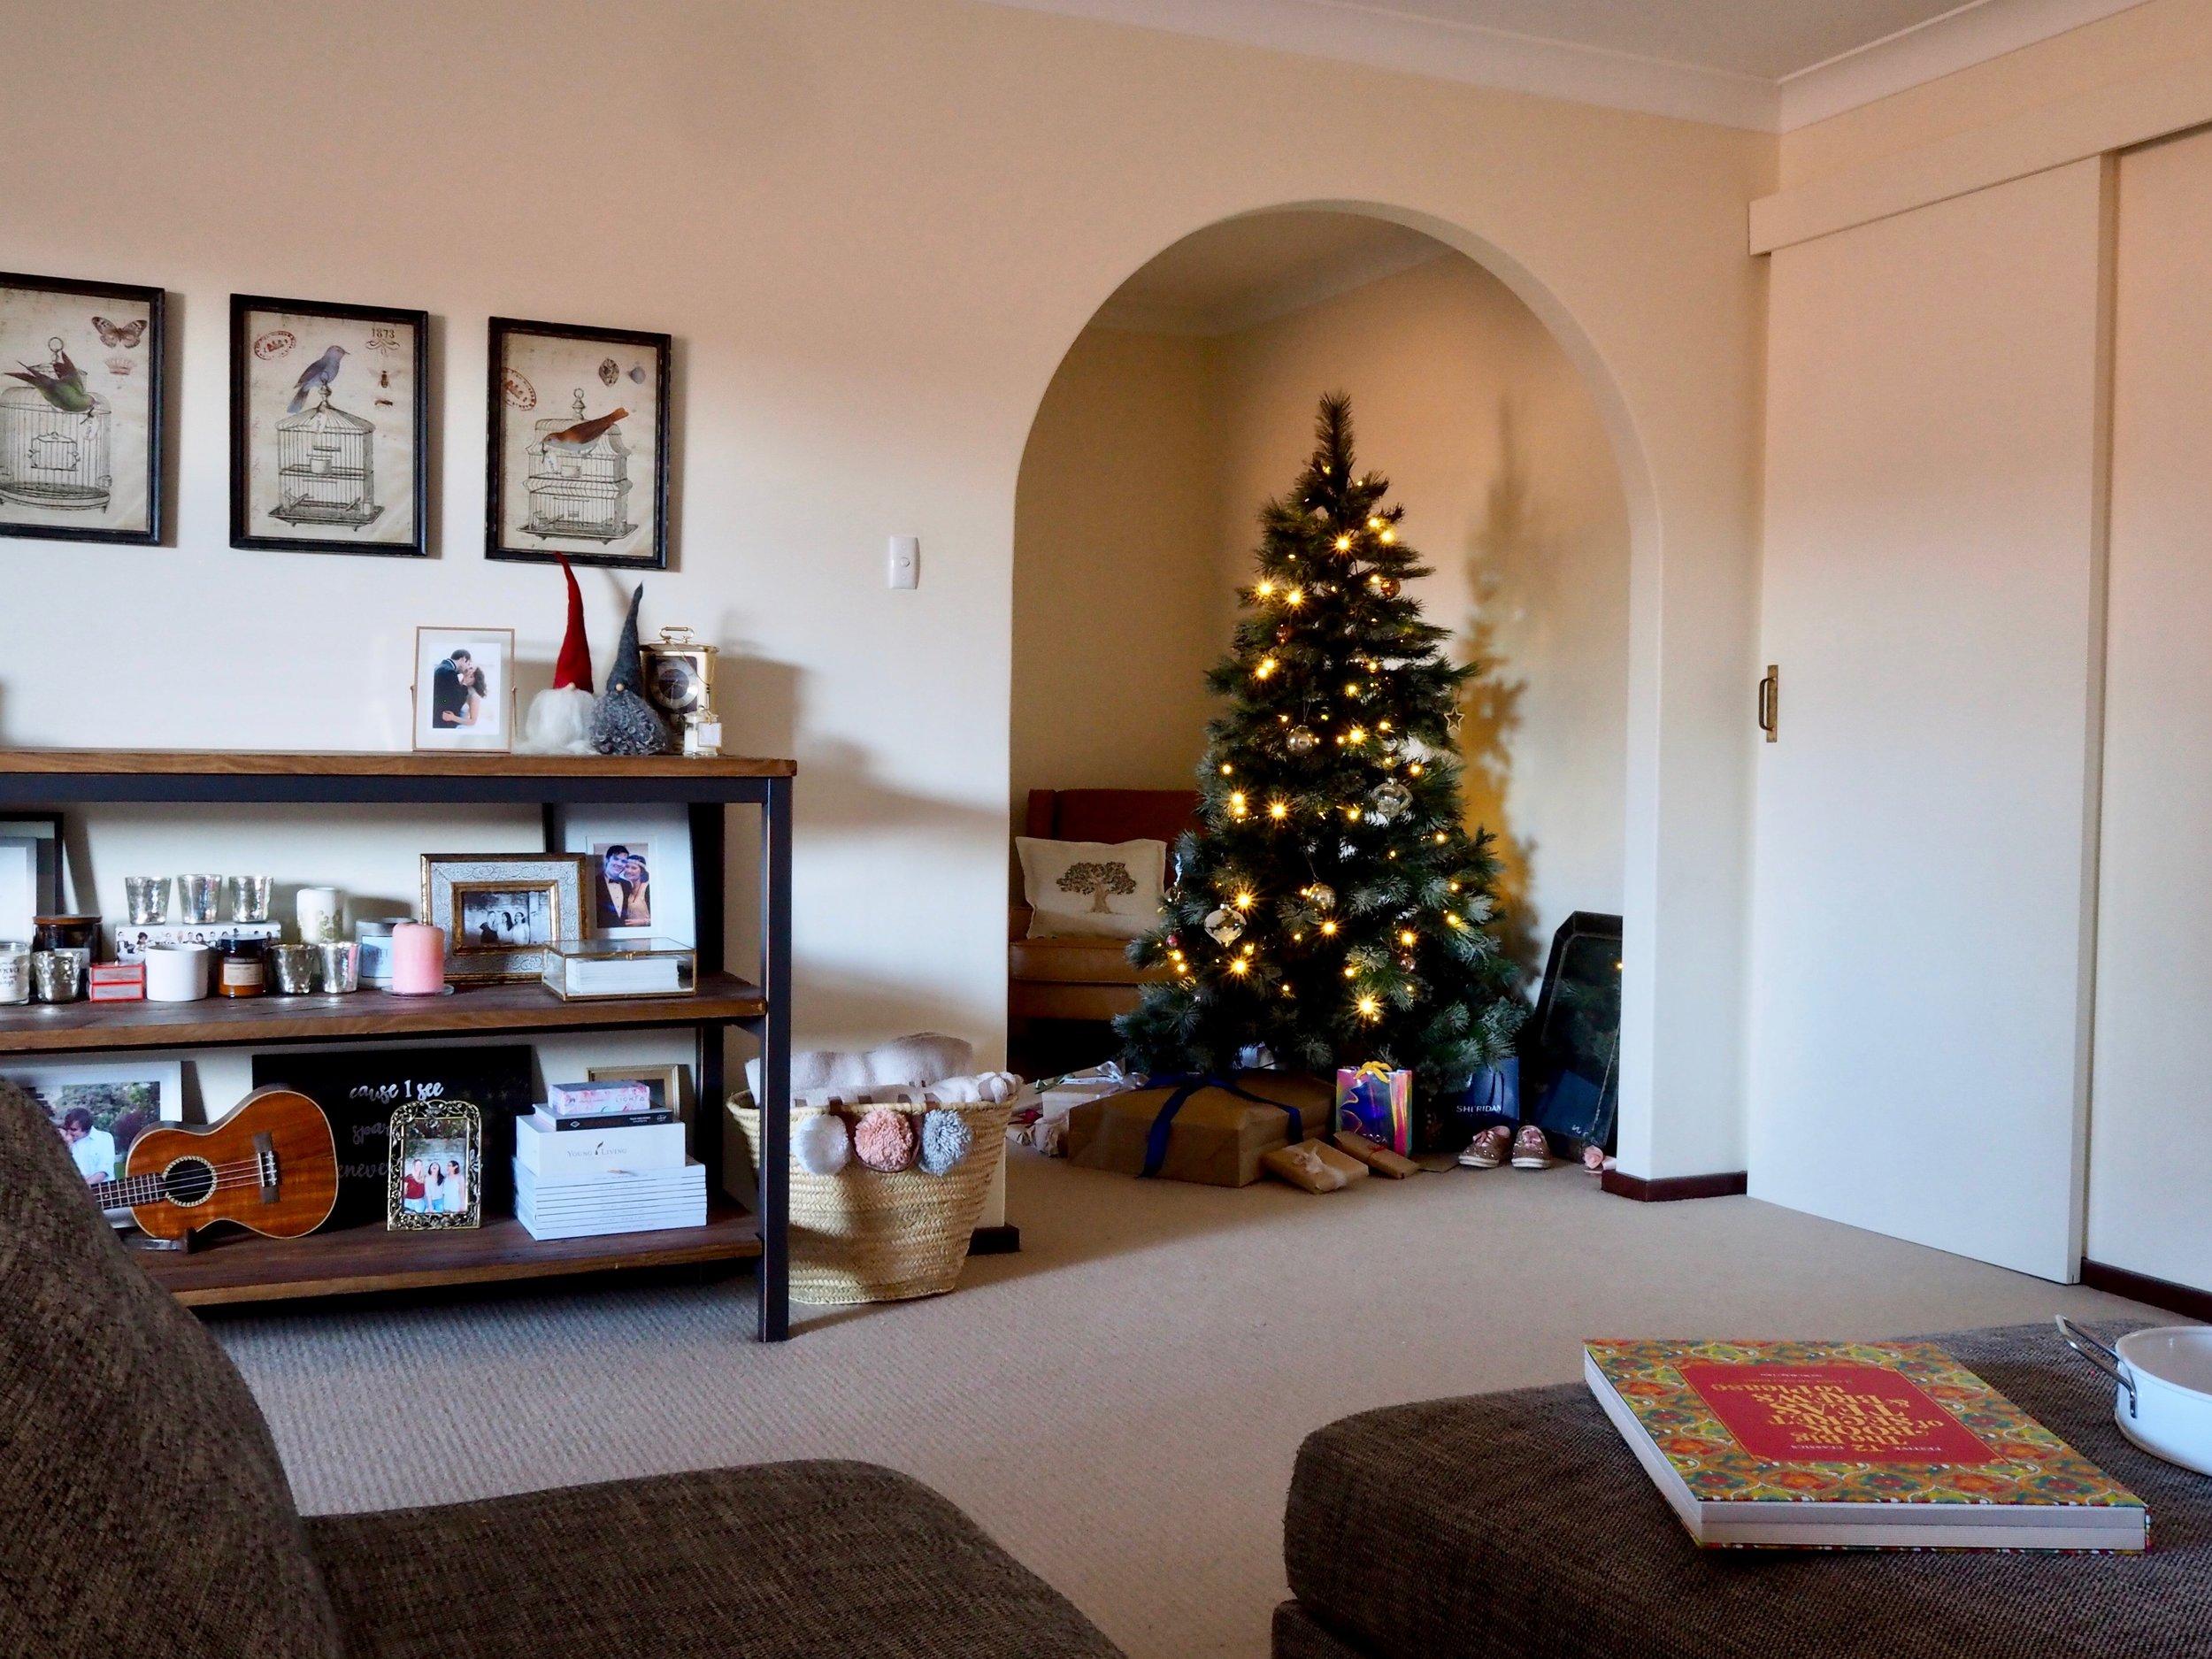 Christmas Apartment DecorP1011310.jpeg